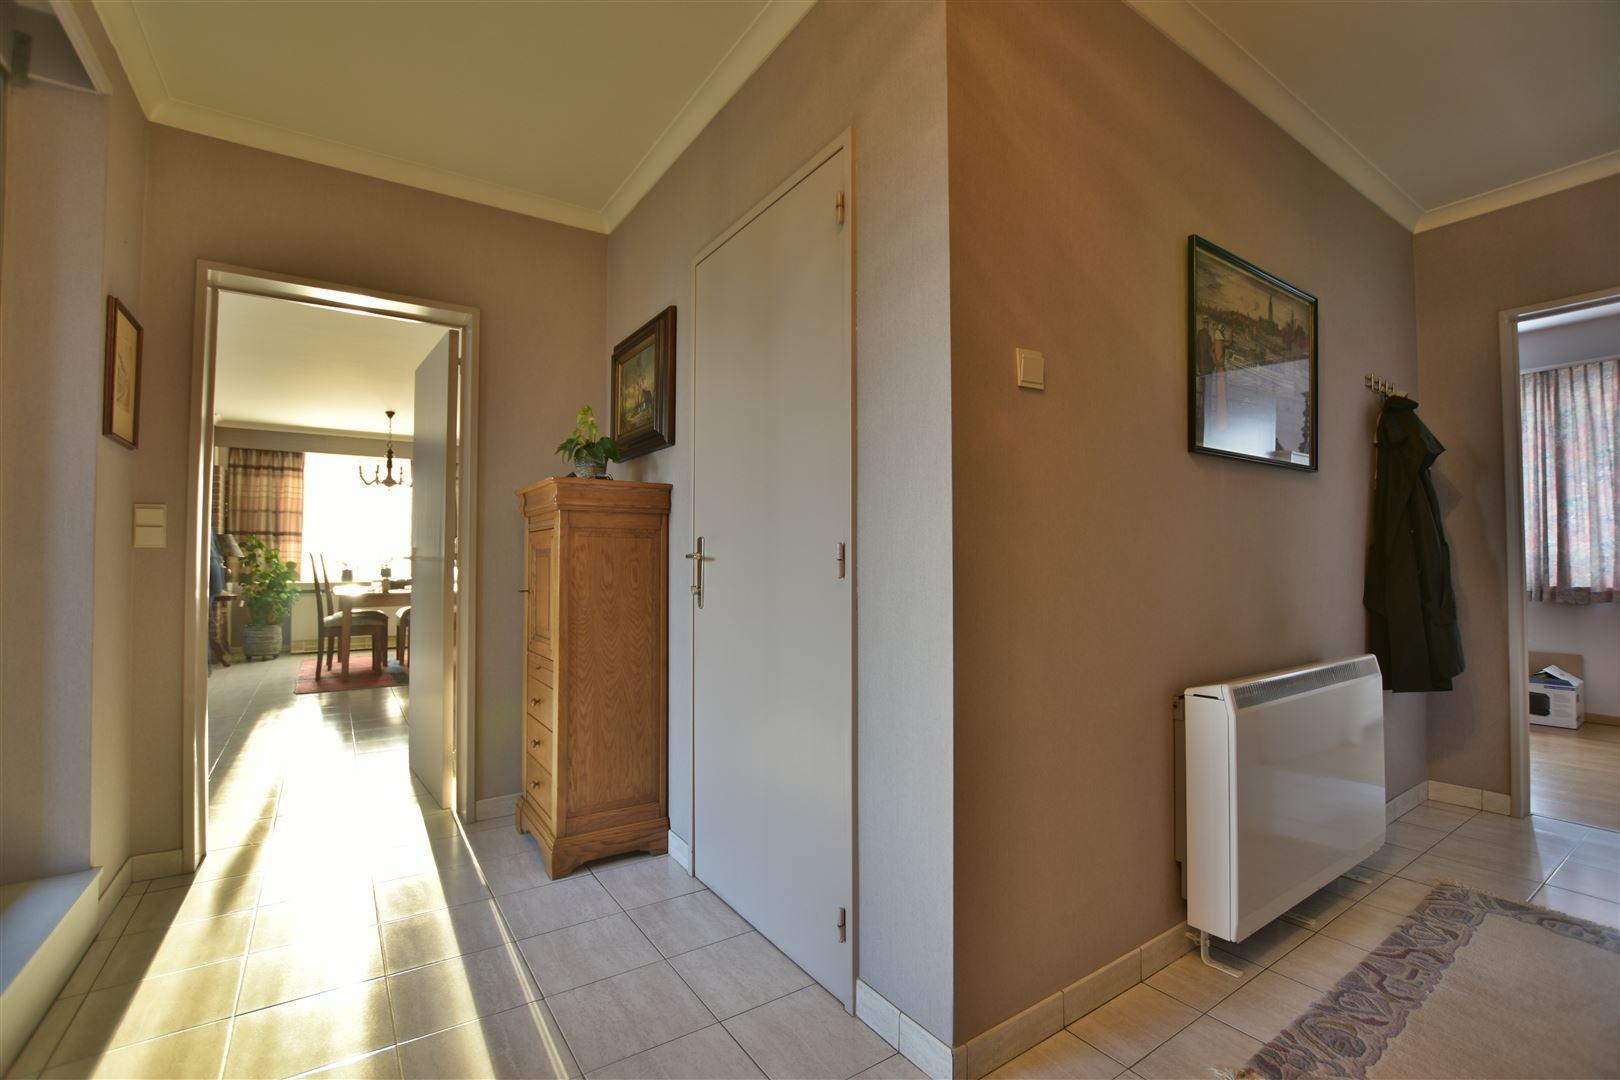 Foto 4 : Appartement te 9140 TEMSE (België) - Prijs € 299.000